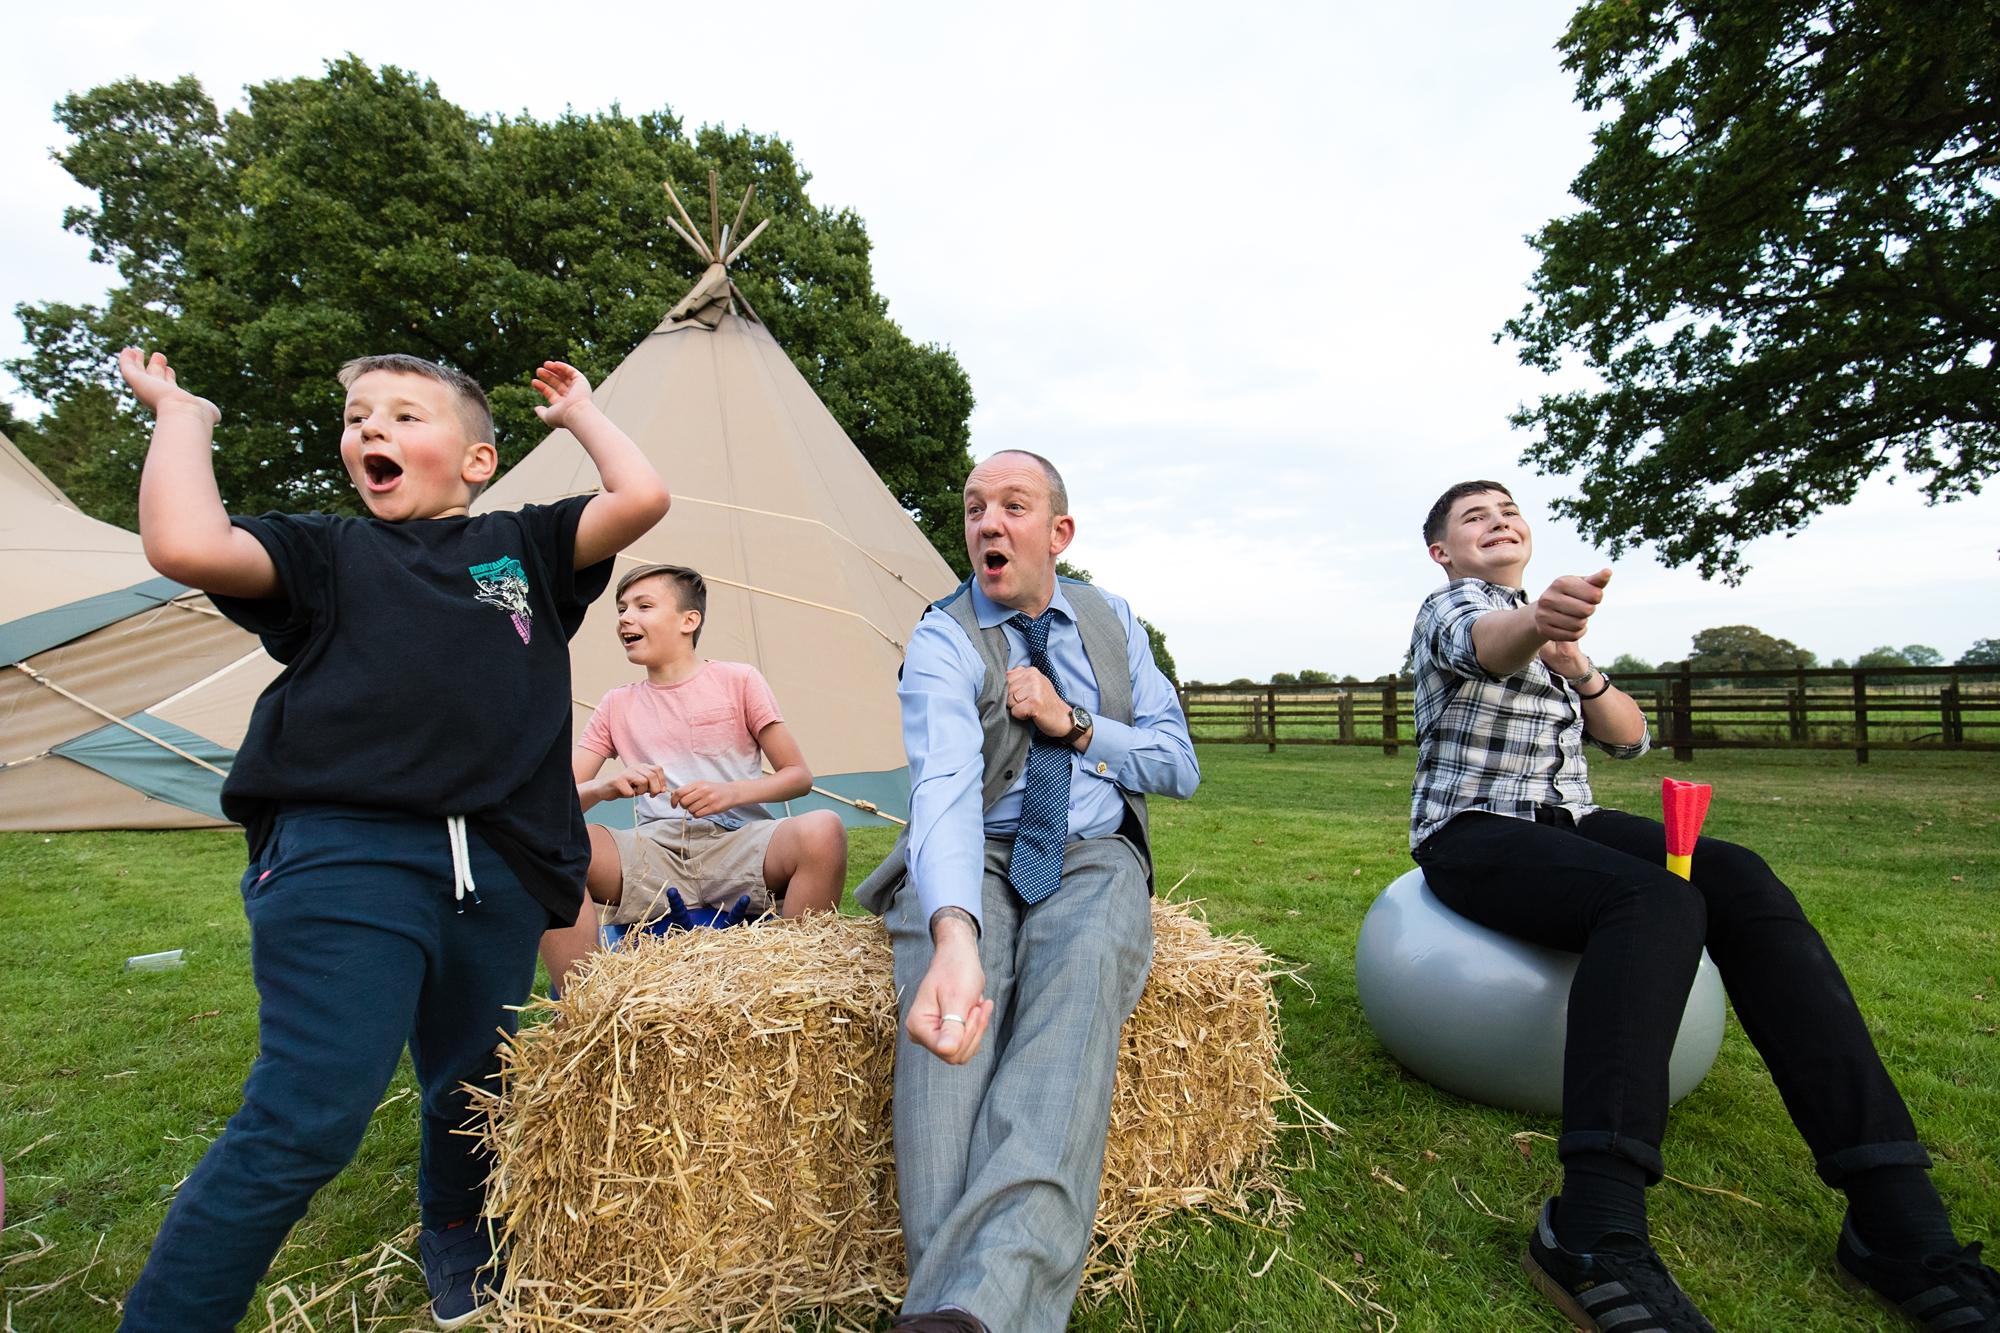 Villa Farm Weddings guests having fun sitting on hay bales